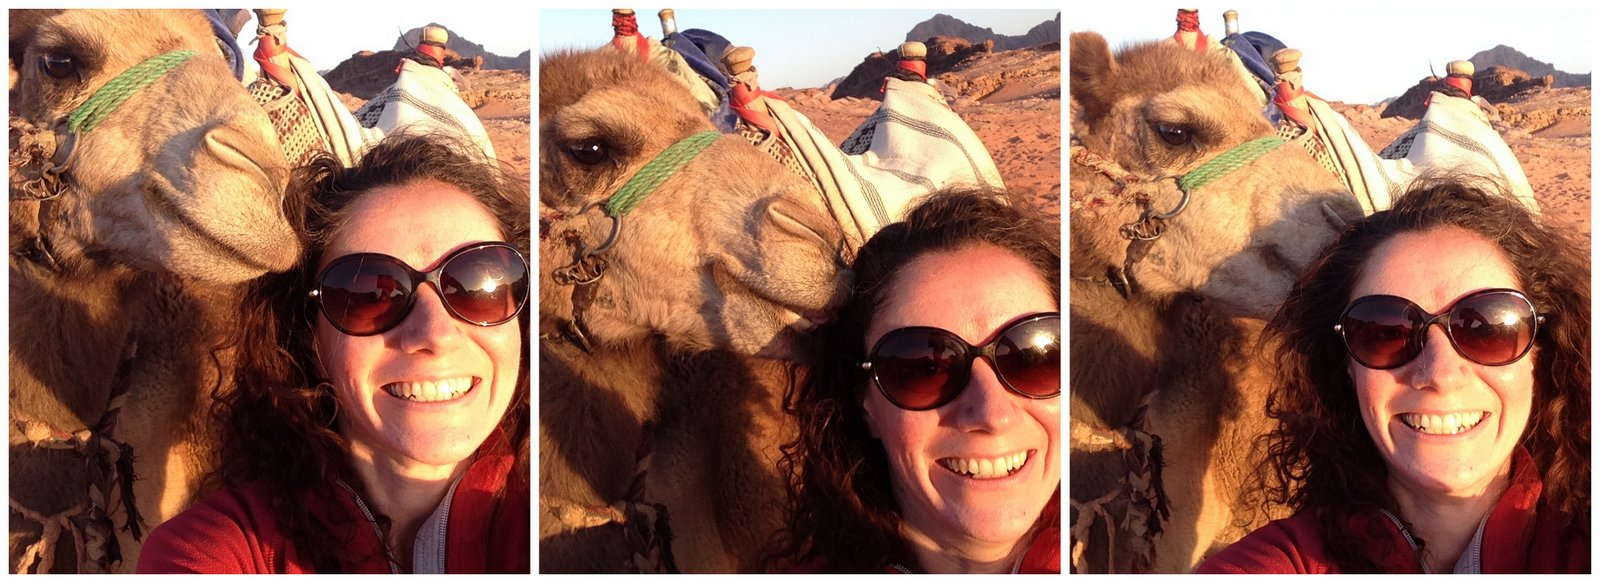 jordanie selfie insolite dromadaire